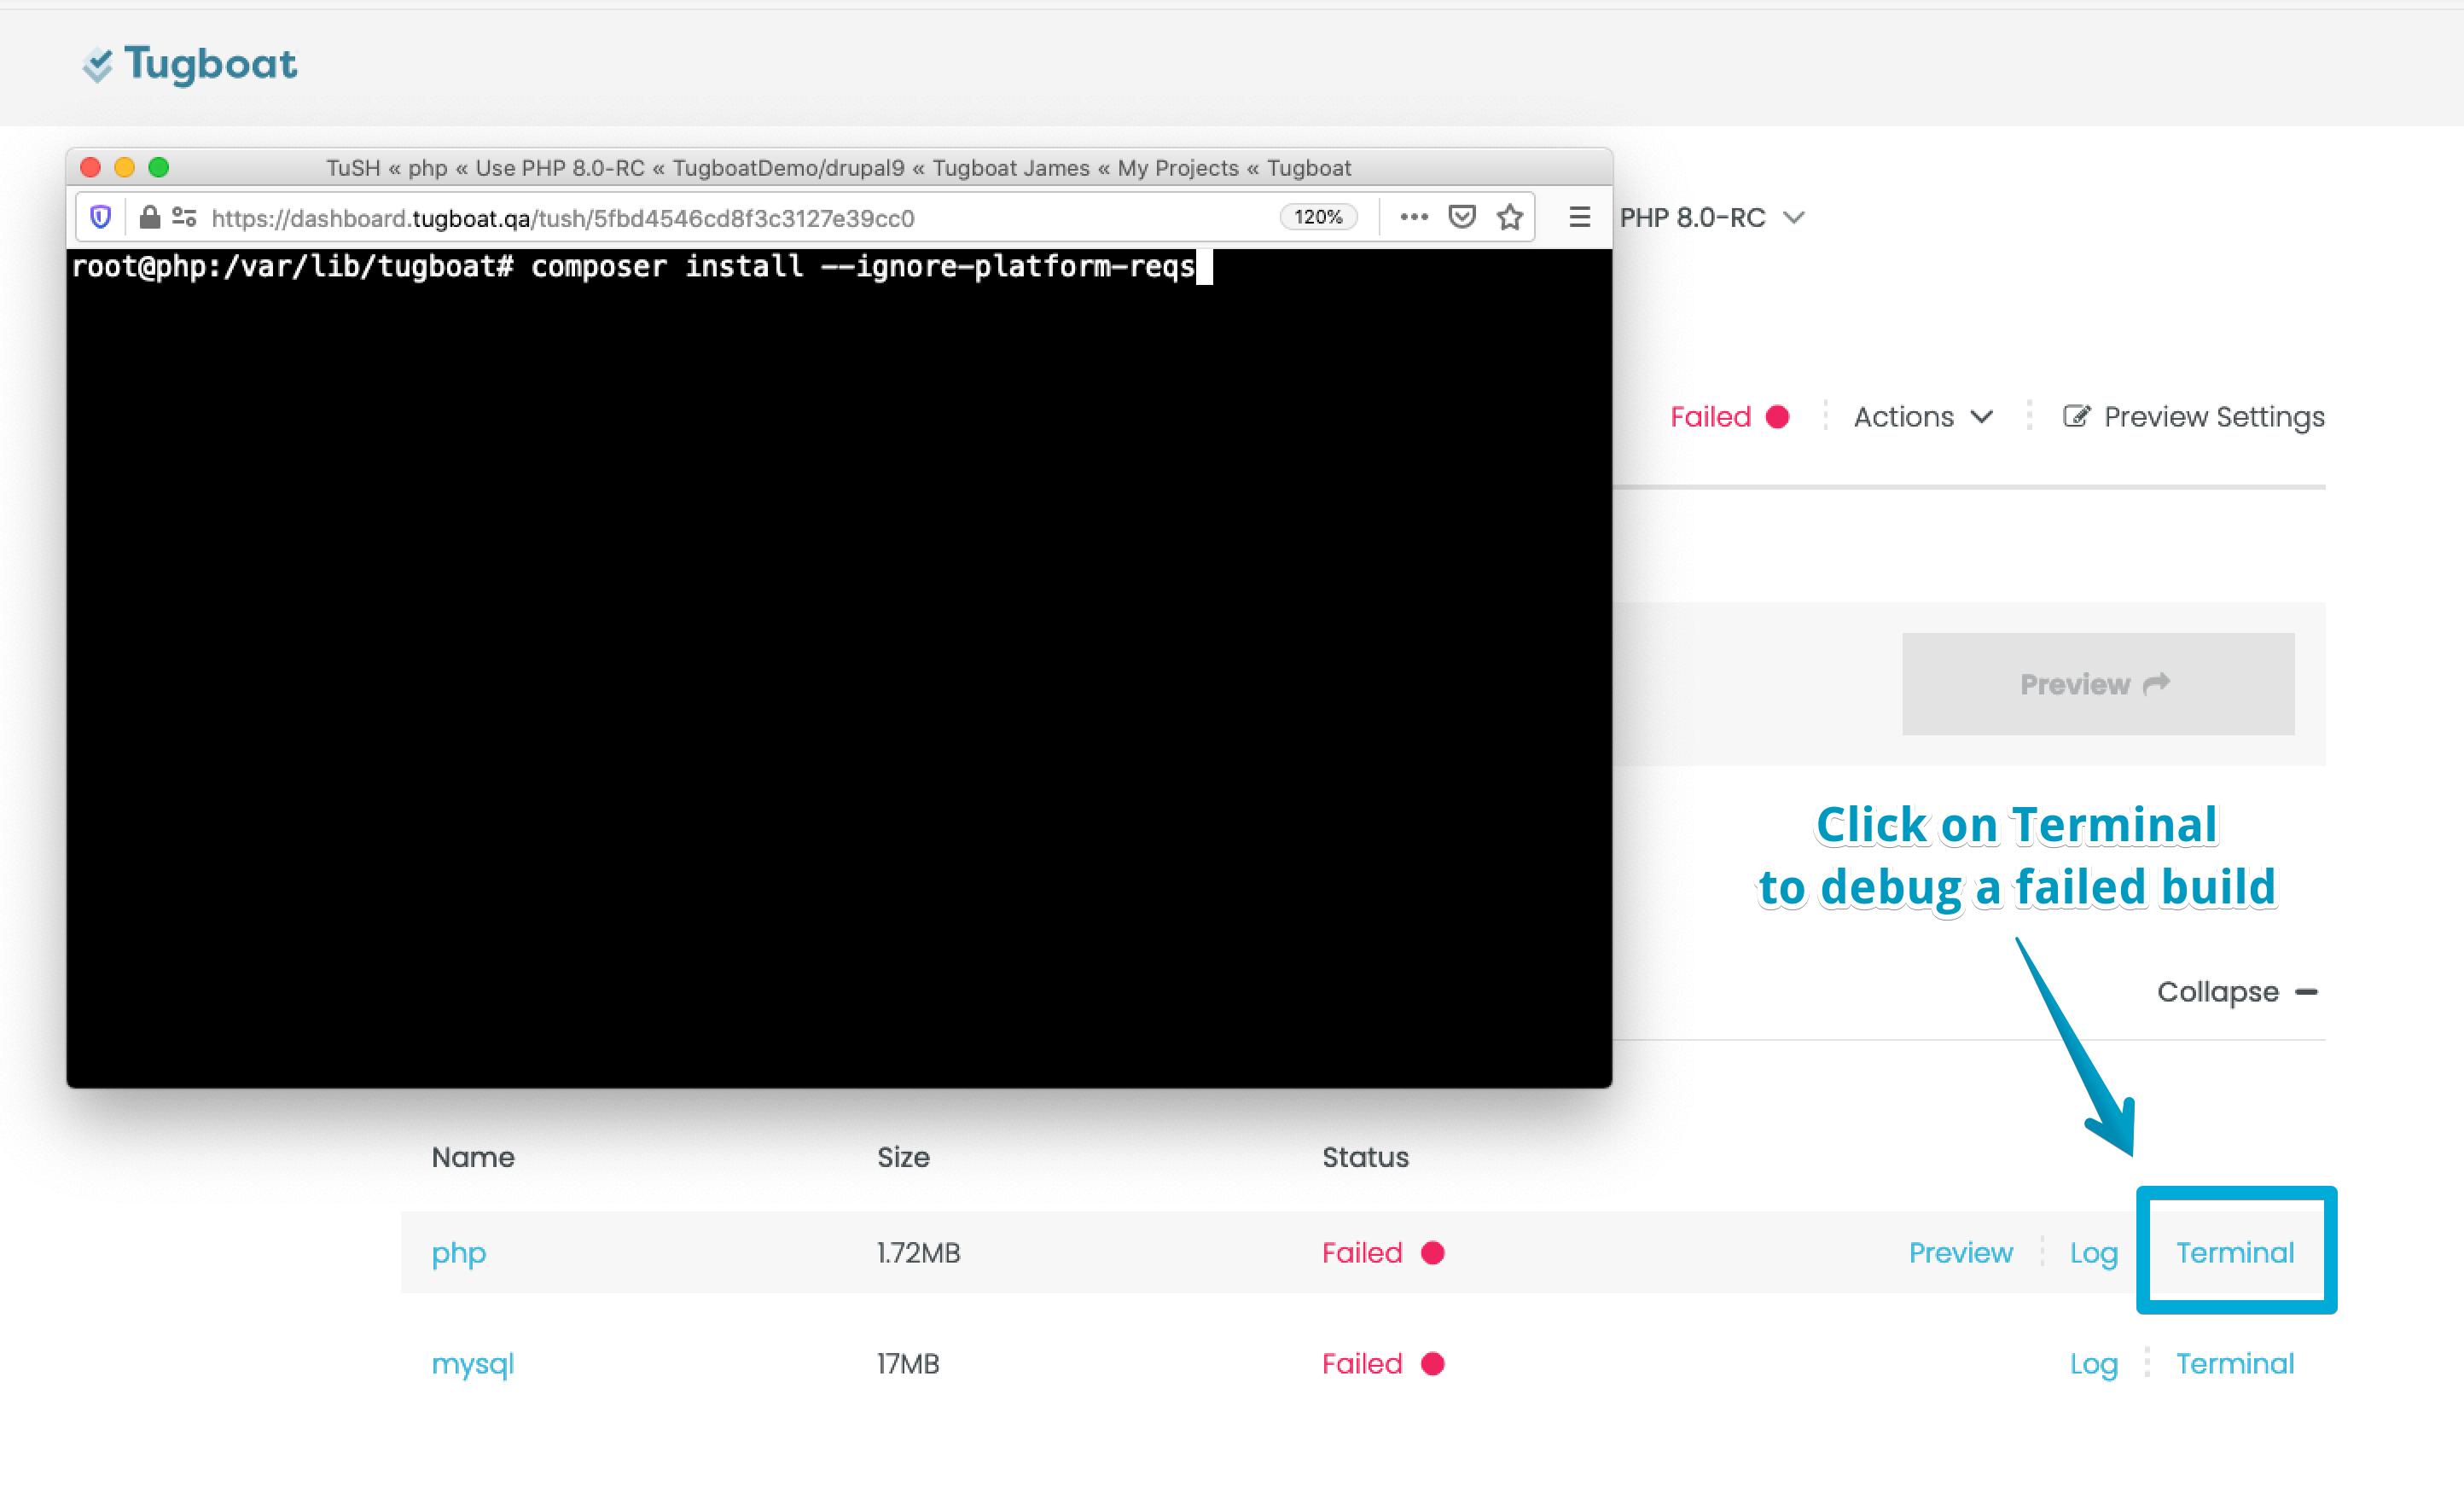 Tugboat Dashboard showing a debugging session.